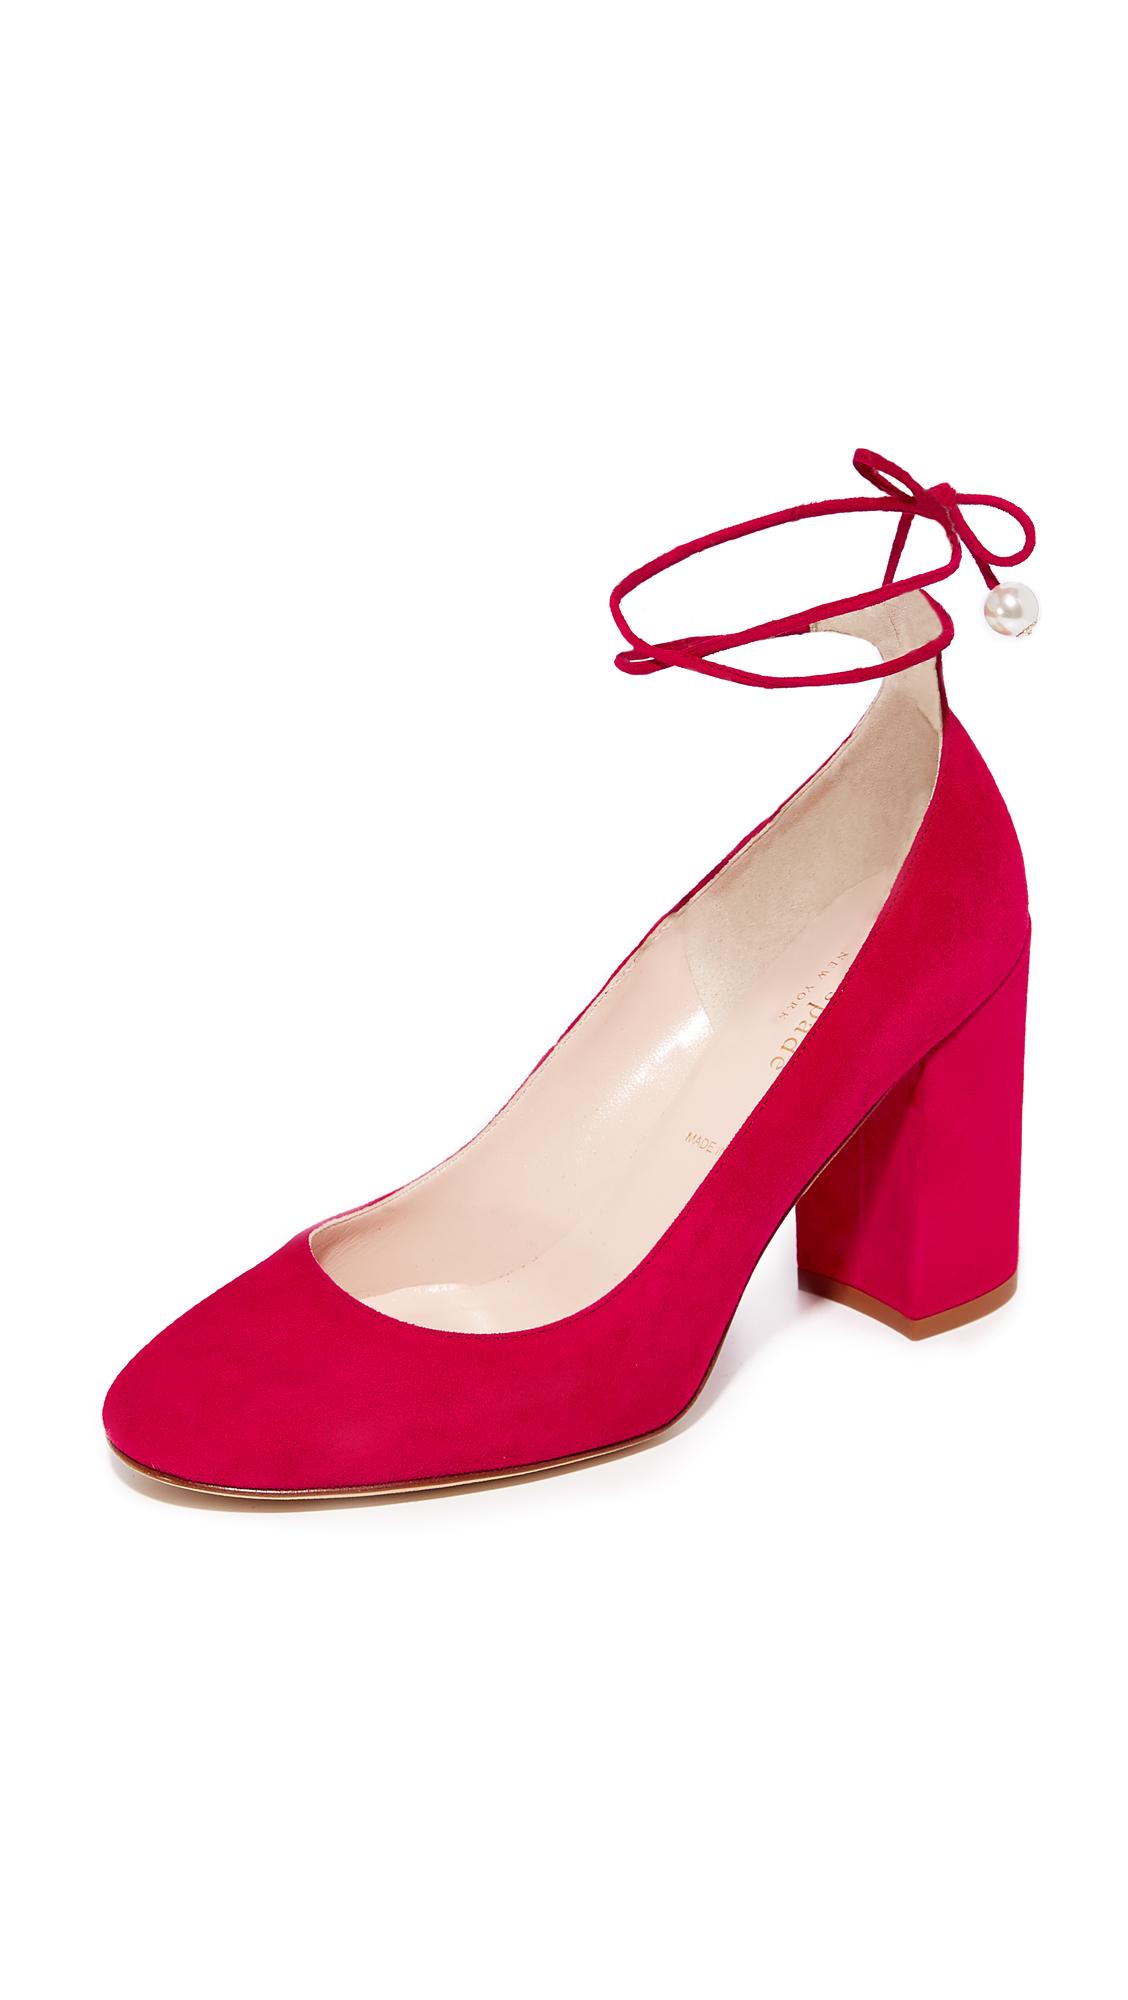 Kate Spade New York Gena Charm Pumps - Red